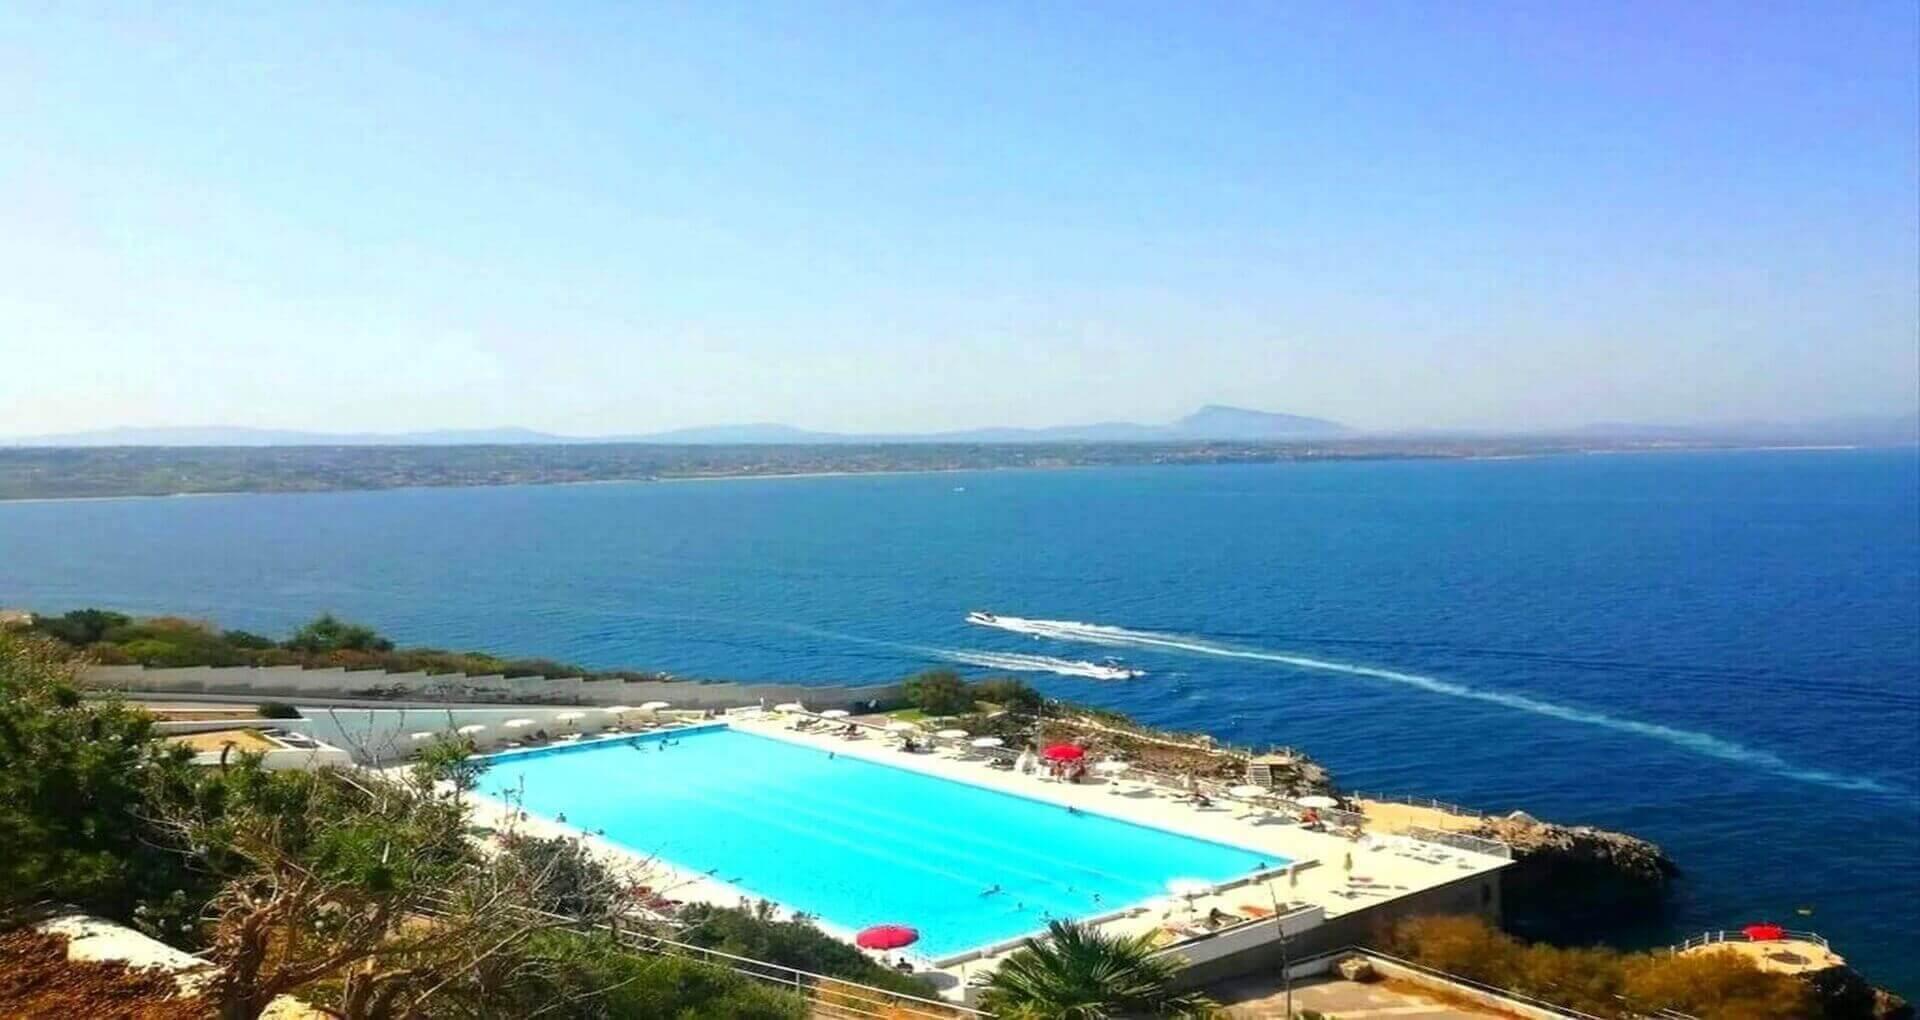 Piscina_Motoscafi_Perla_del_golfo-Resort_sfondodef